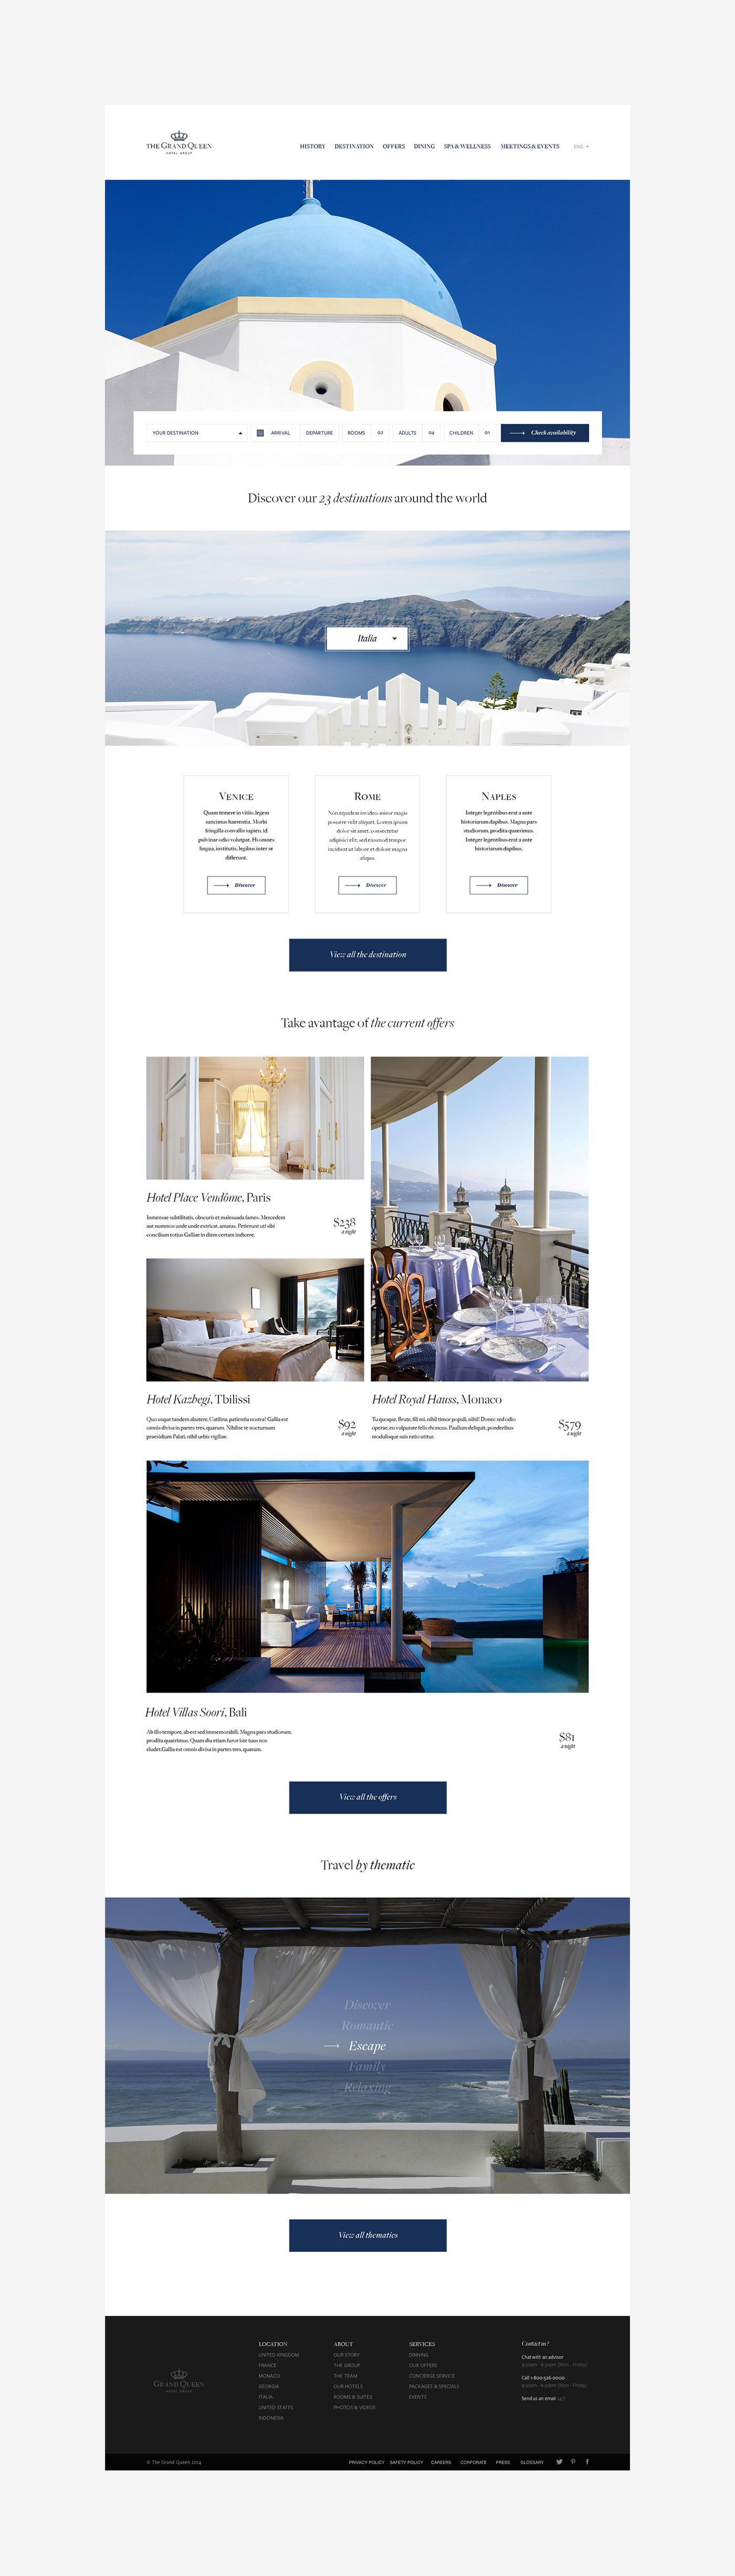 Grand Queen Hotel,hotels,luxury,palatial hotels,Queen victoria,Travel,journey,voyage